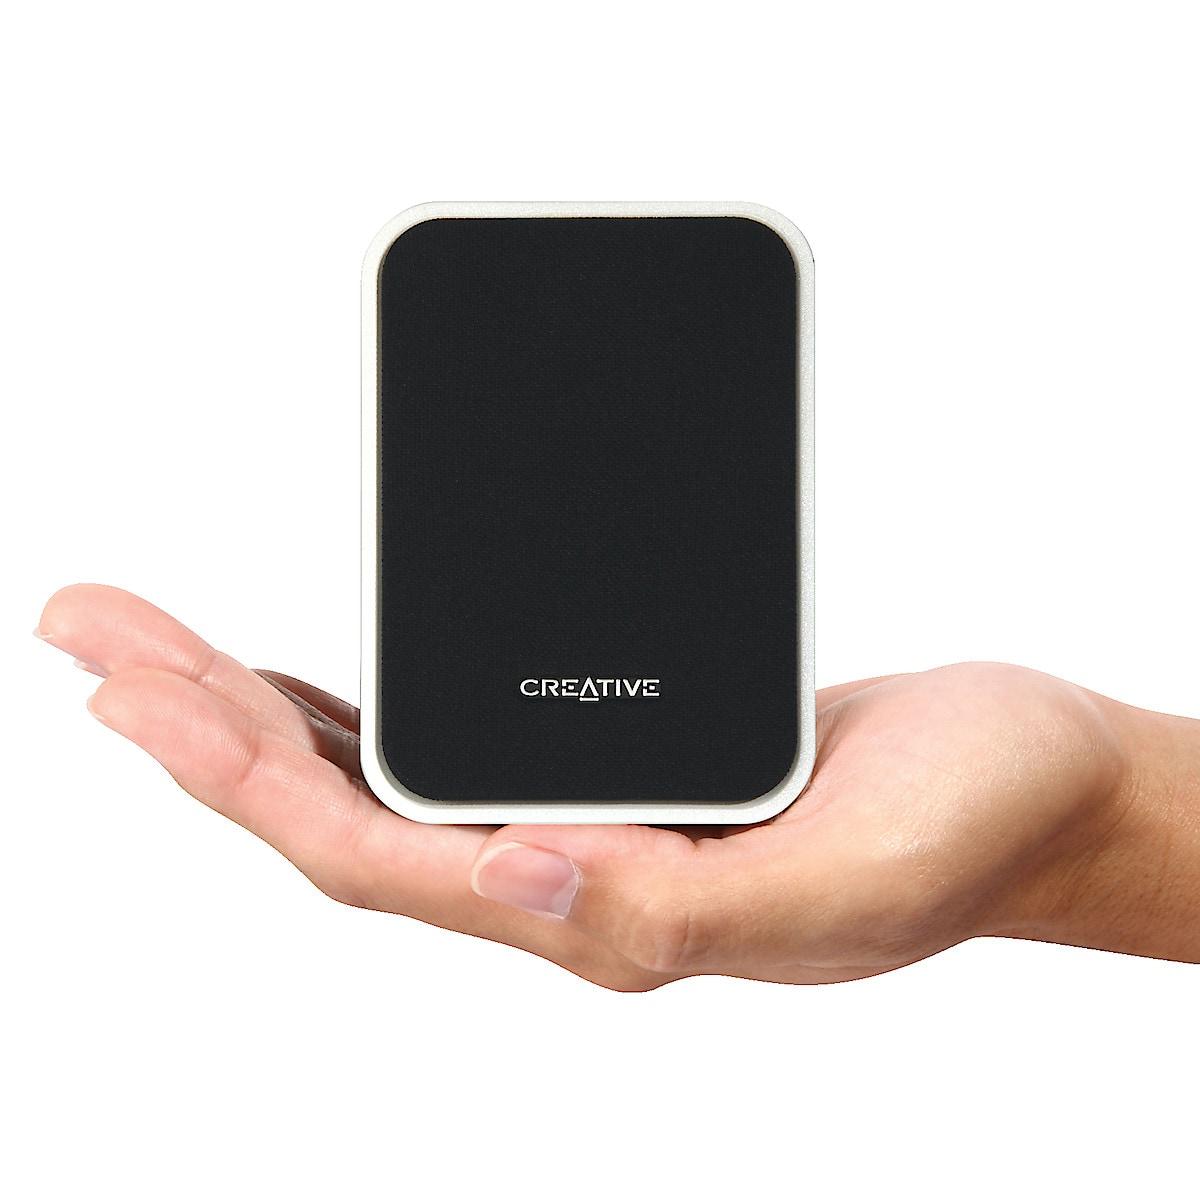 Creative Inspire S2 Wireless 2.1 Speakers